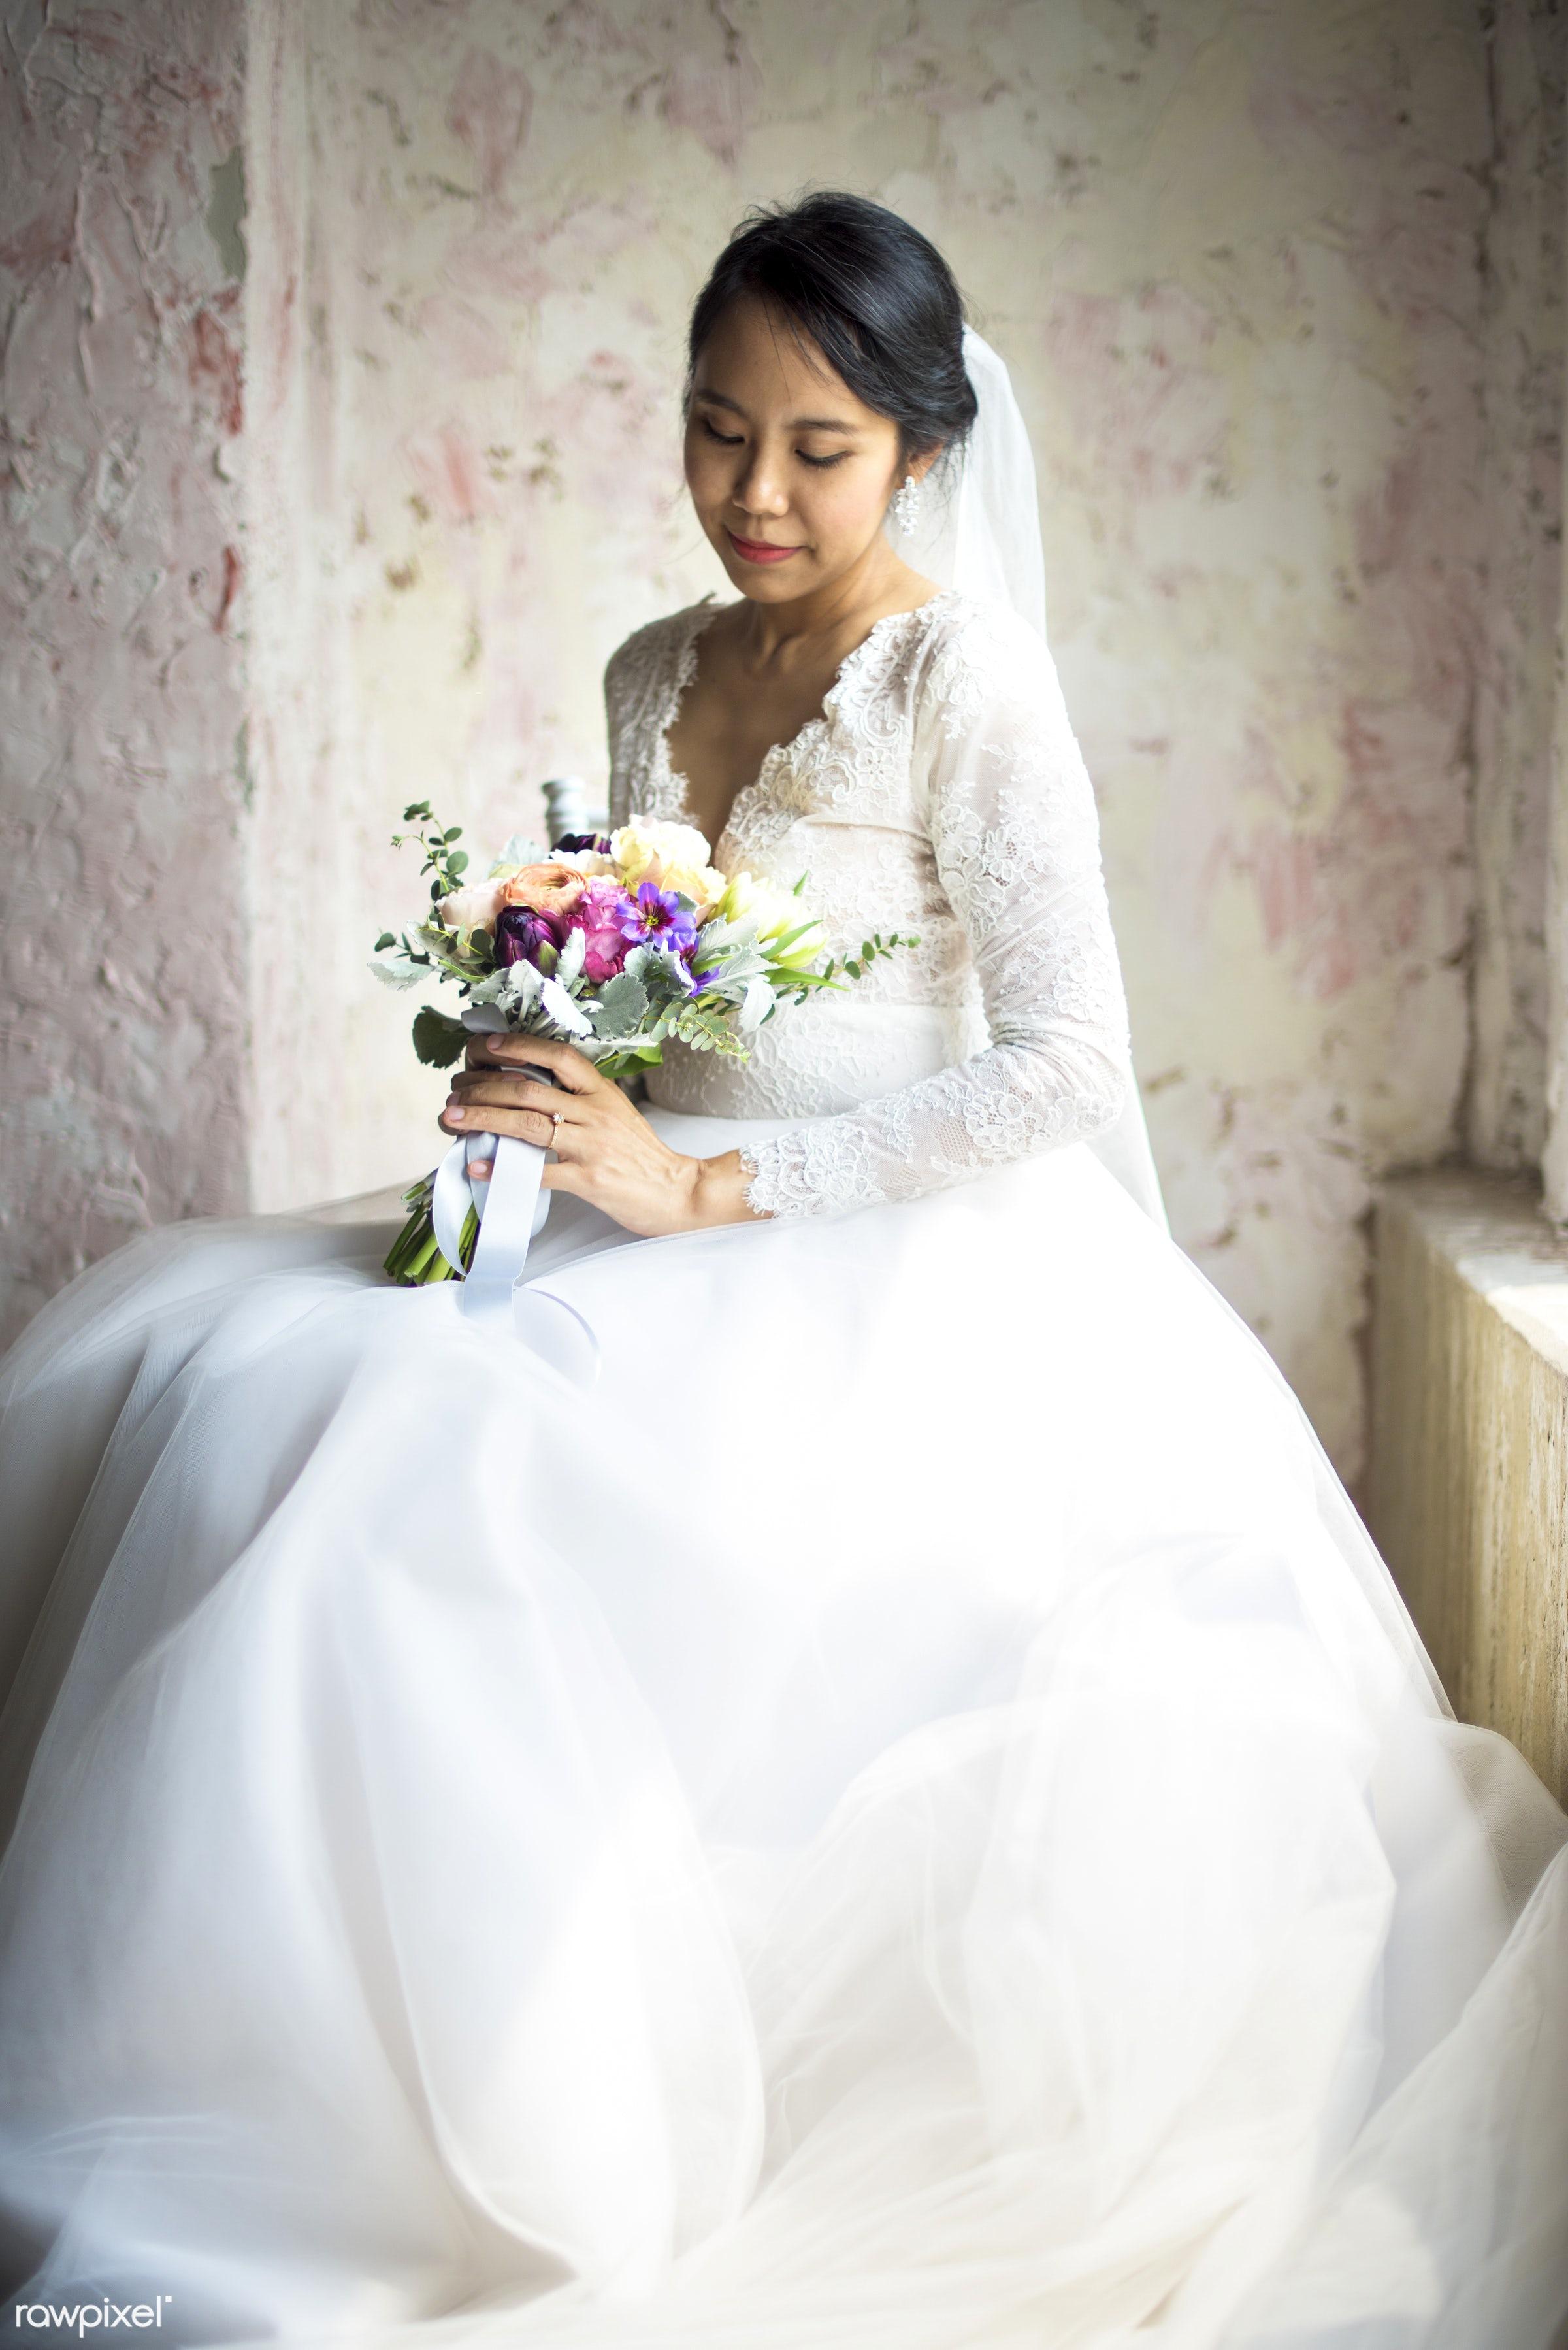 bouquet, diverse, holding, white dress, asian, real, nature, fresh, hands, woman, event, bride, flowers, flora, ceremony,...